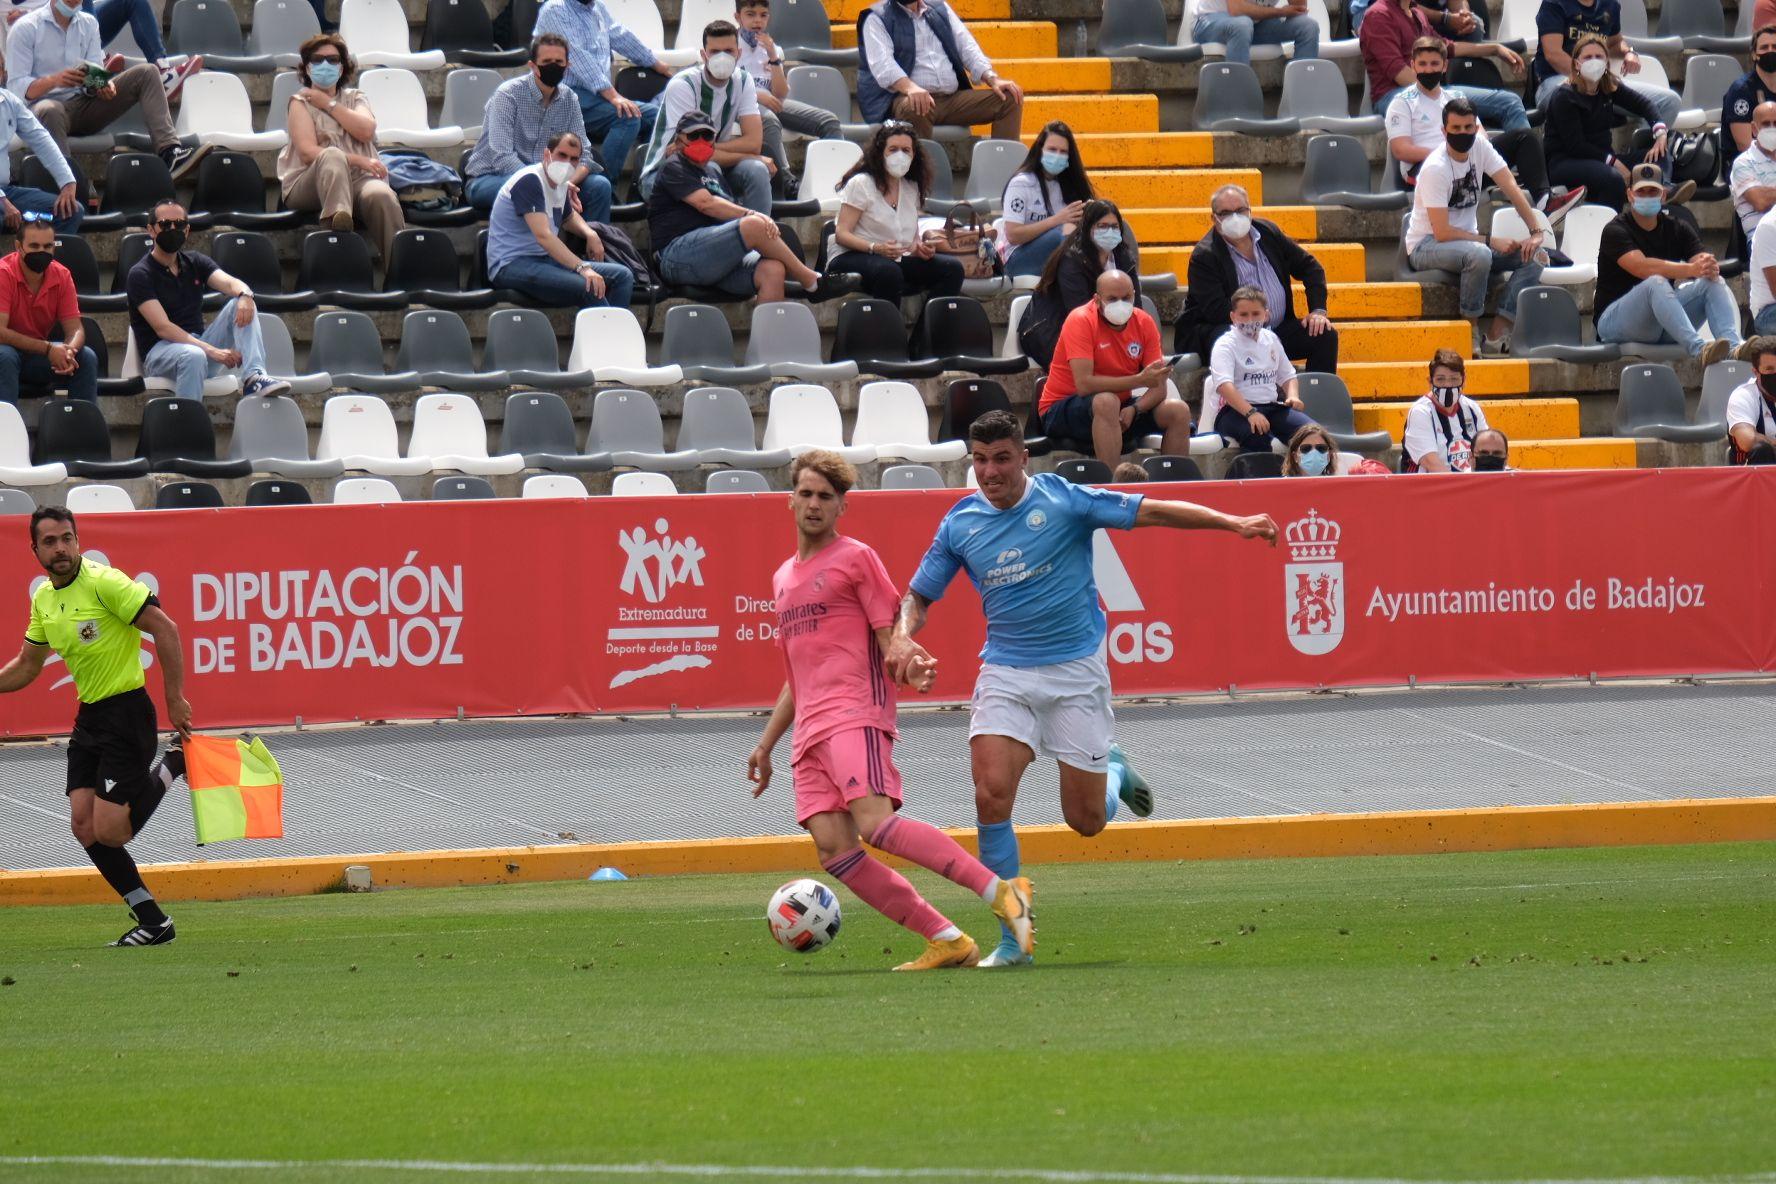 Partido UD Ibiza - Real Madrid-Castilla